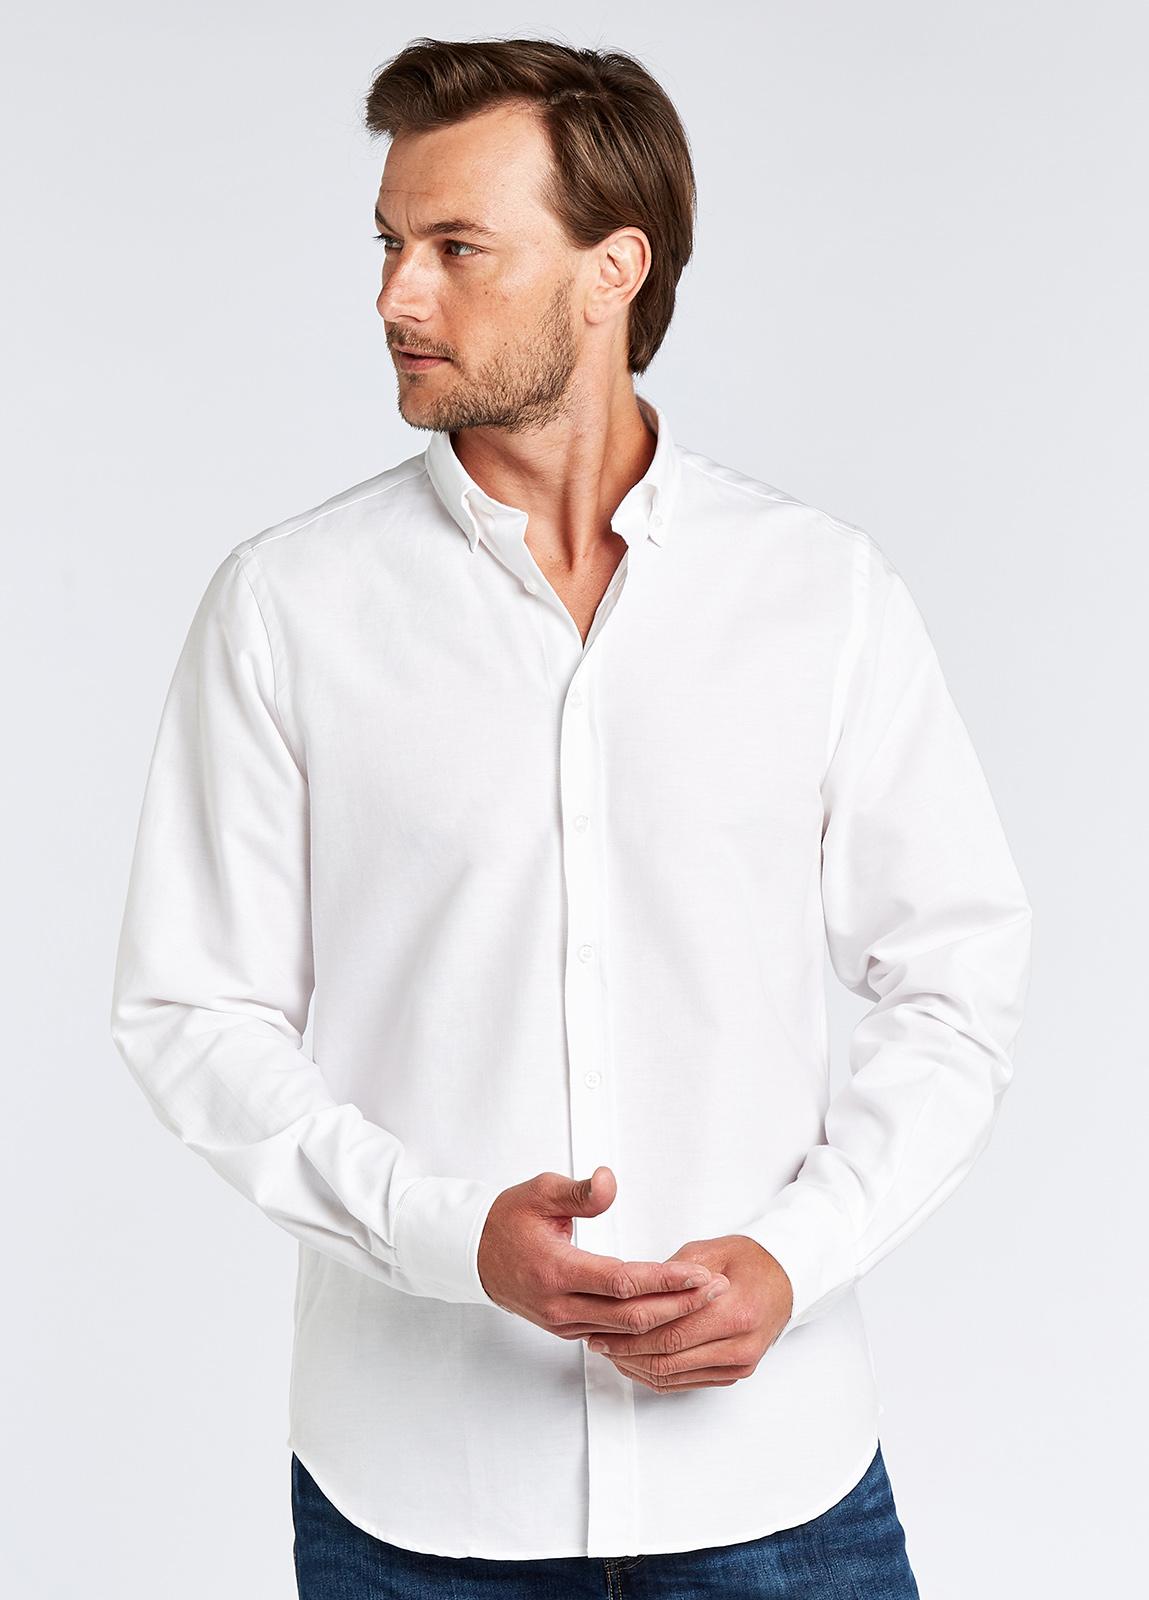 Castlecove Oxford Shirt - White